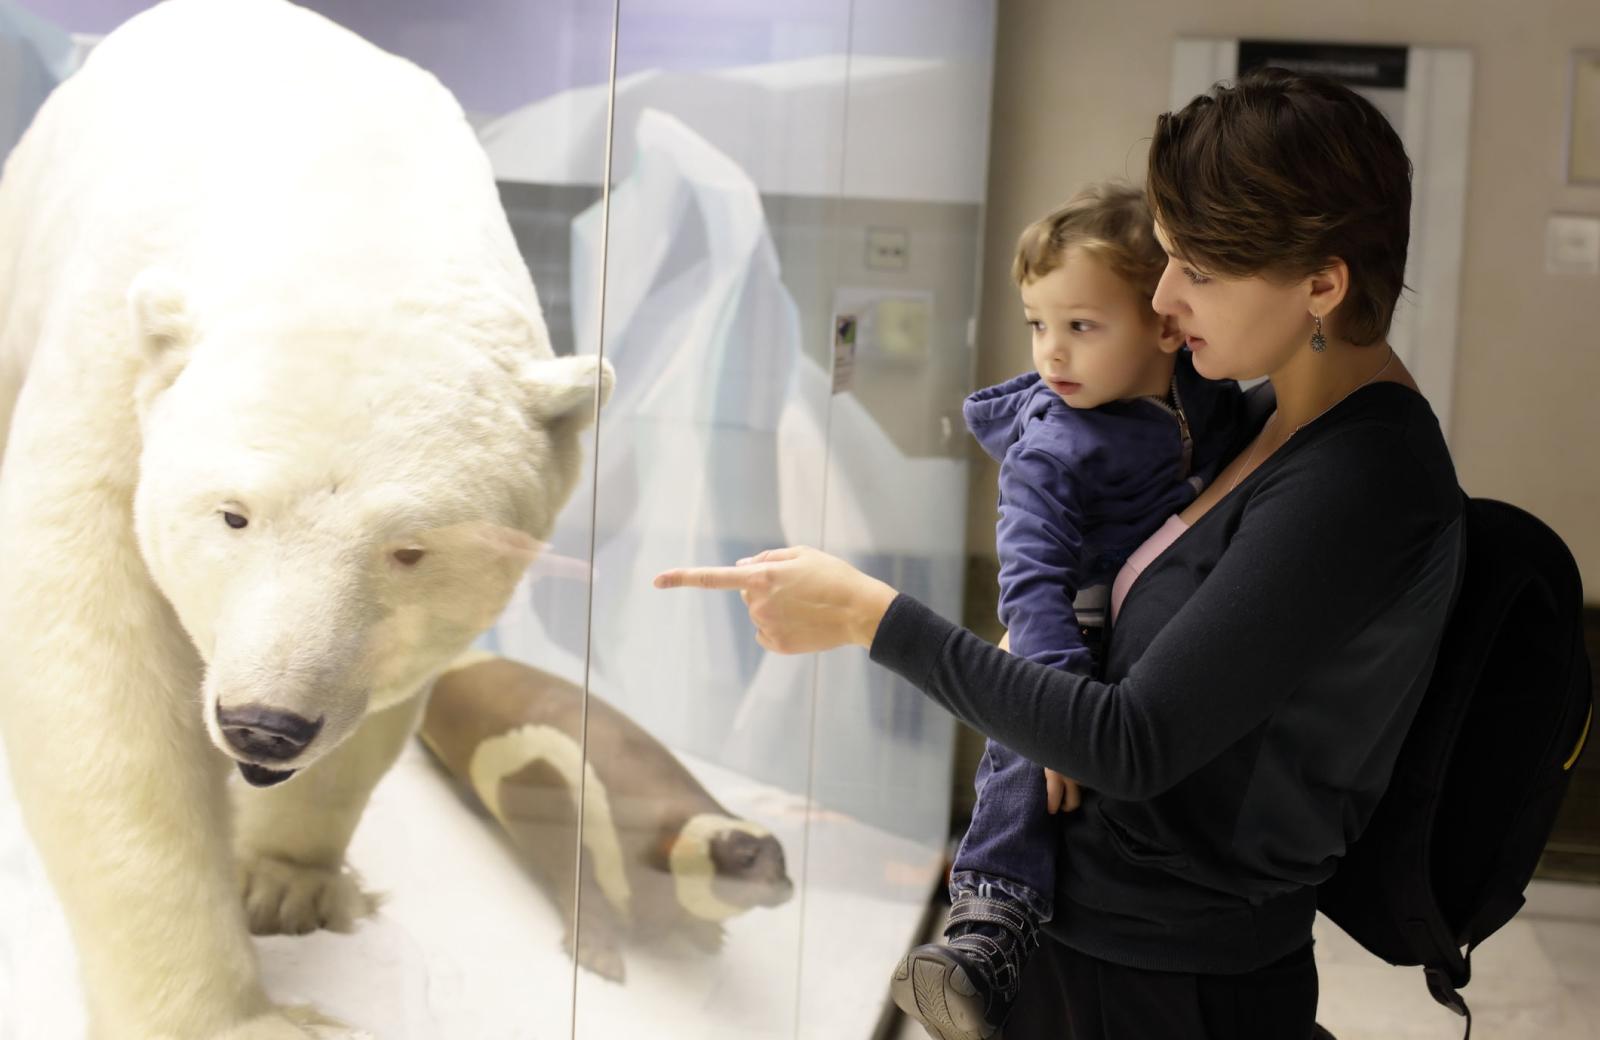 bear exhibit at the museum dtla